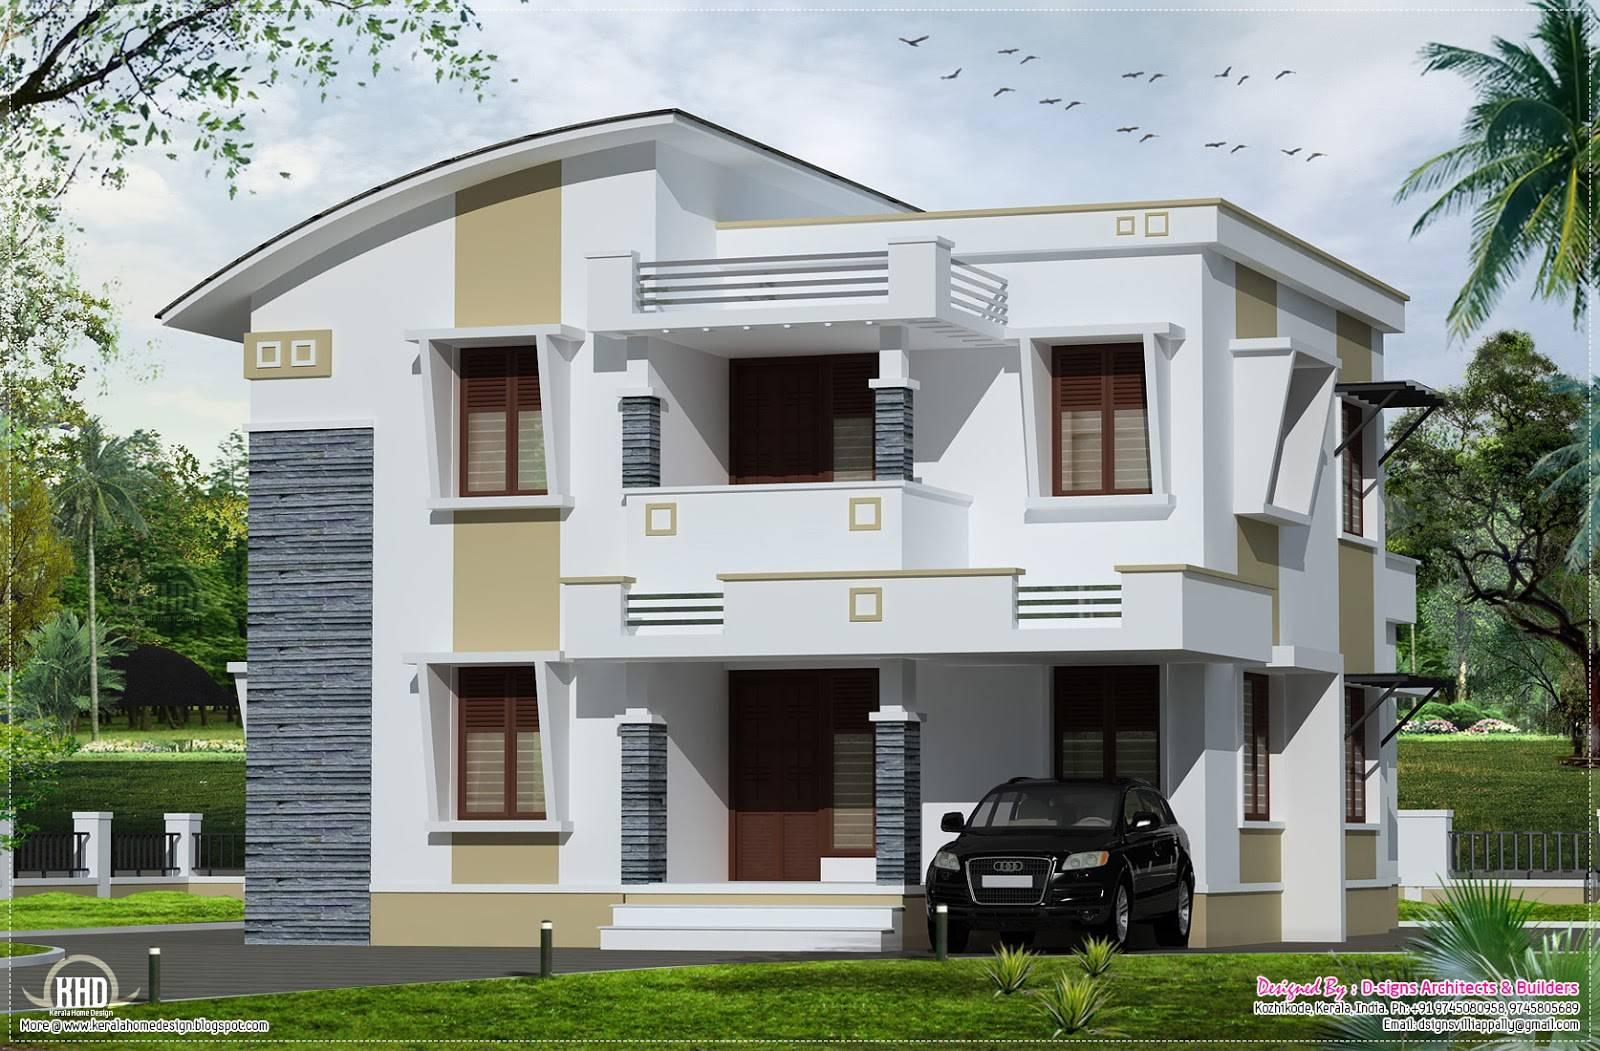 Simple Flat Roof Home Design Feet Kerala Home Plans Blueprints 59394